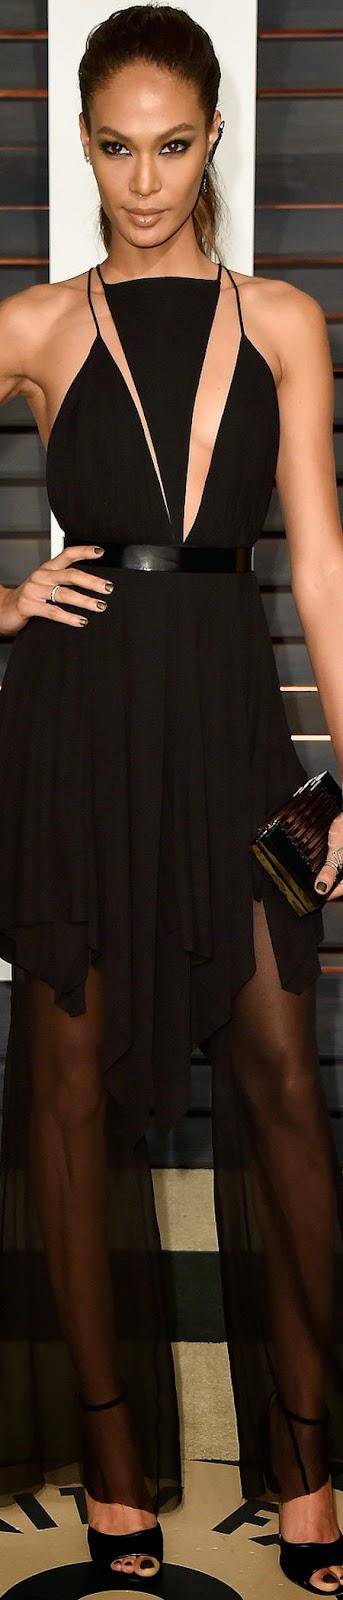 2015 Vanity Fair Oscar Party  Joan Smalls